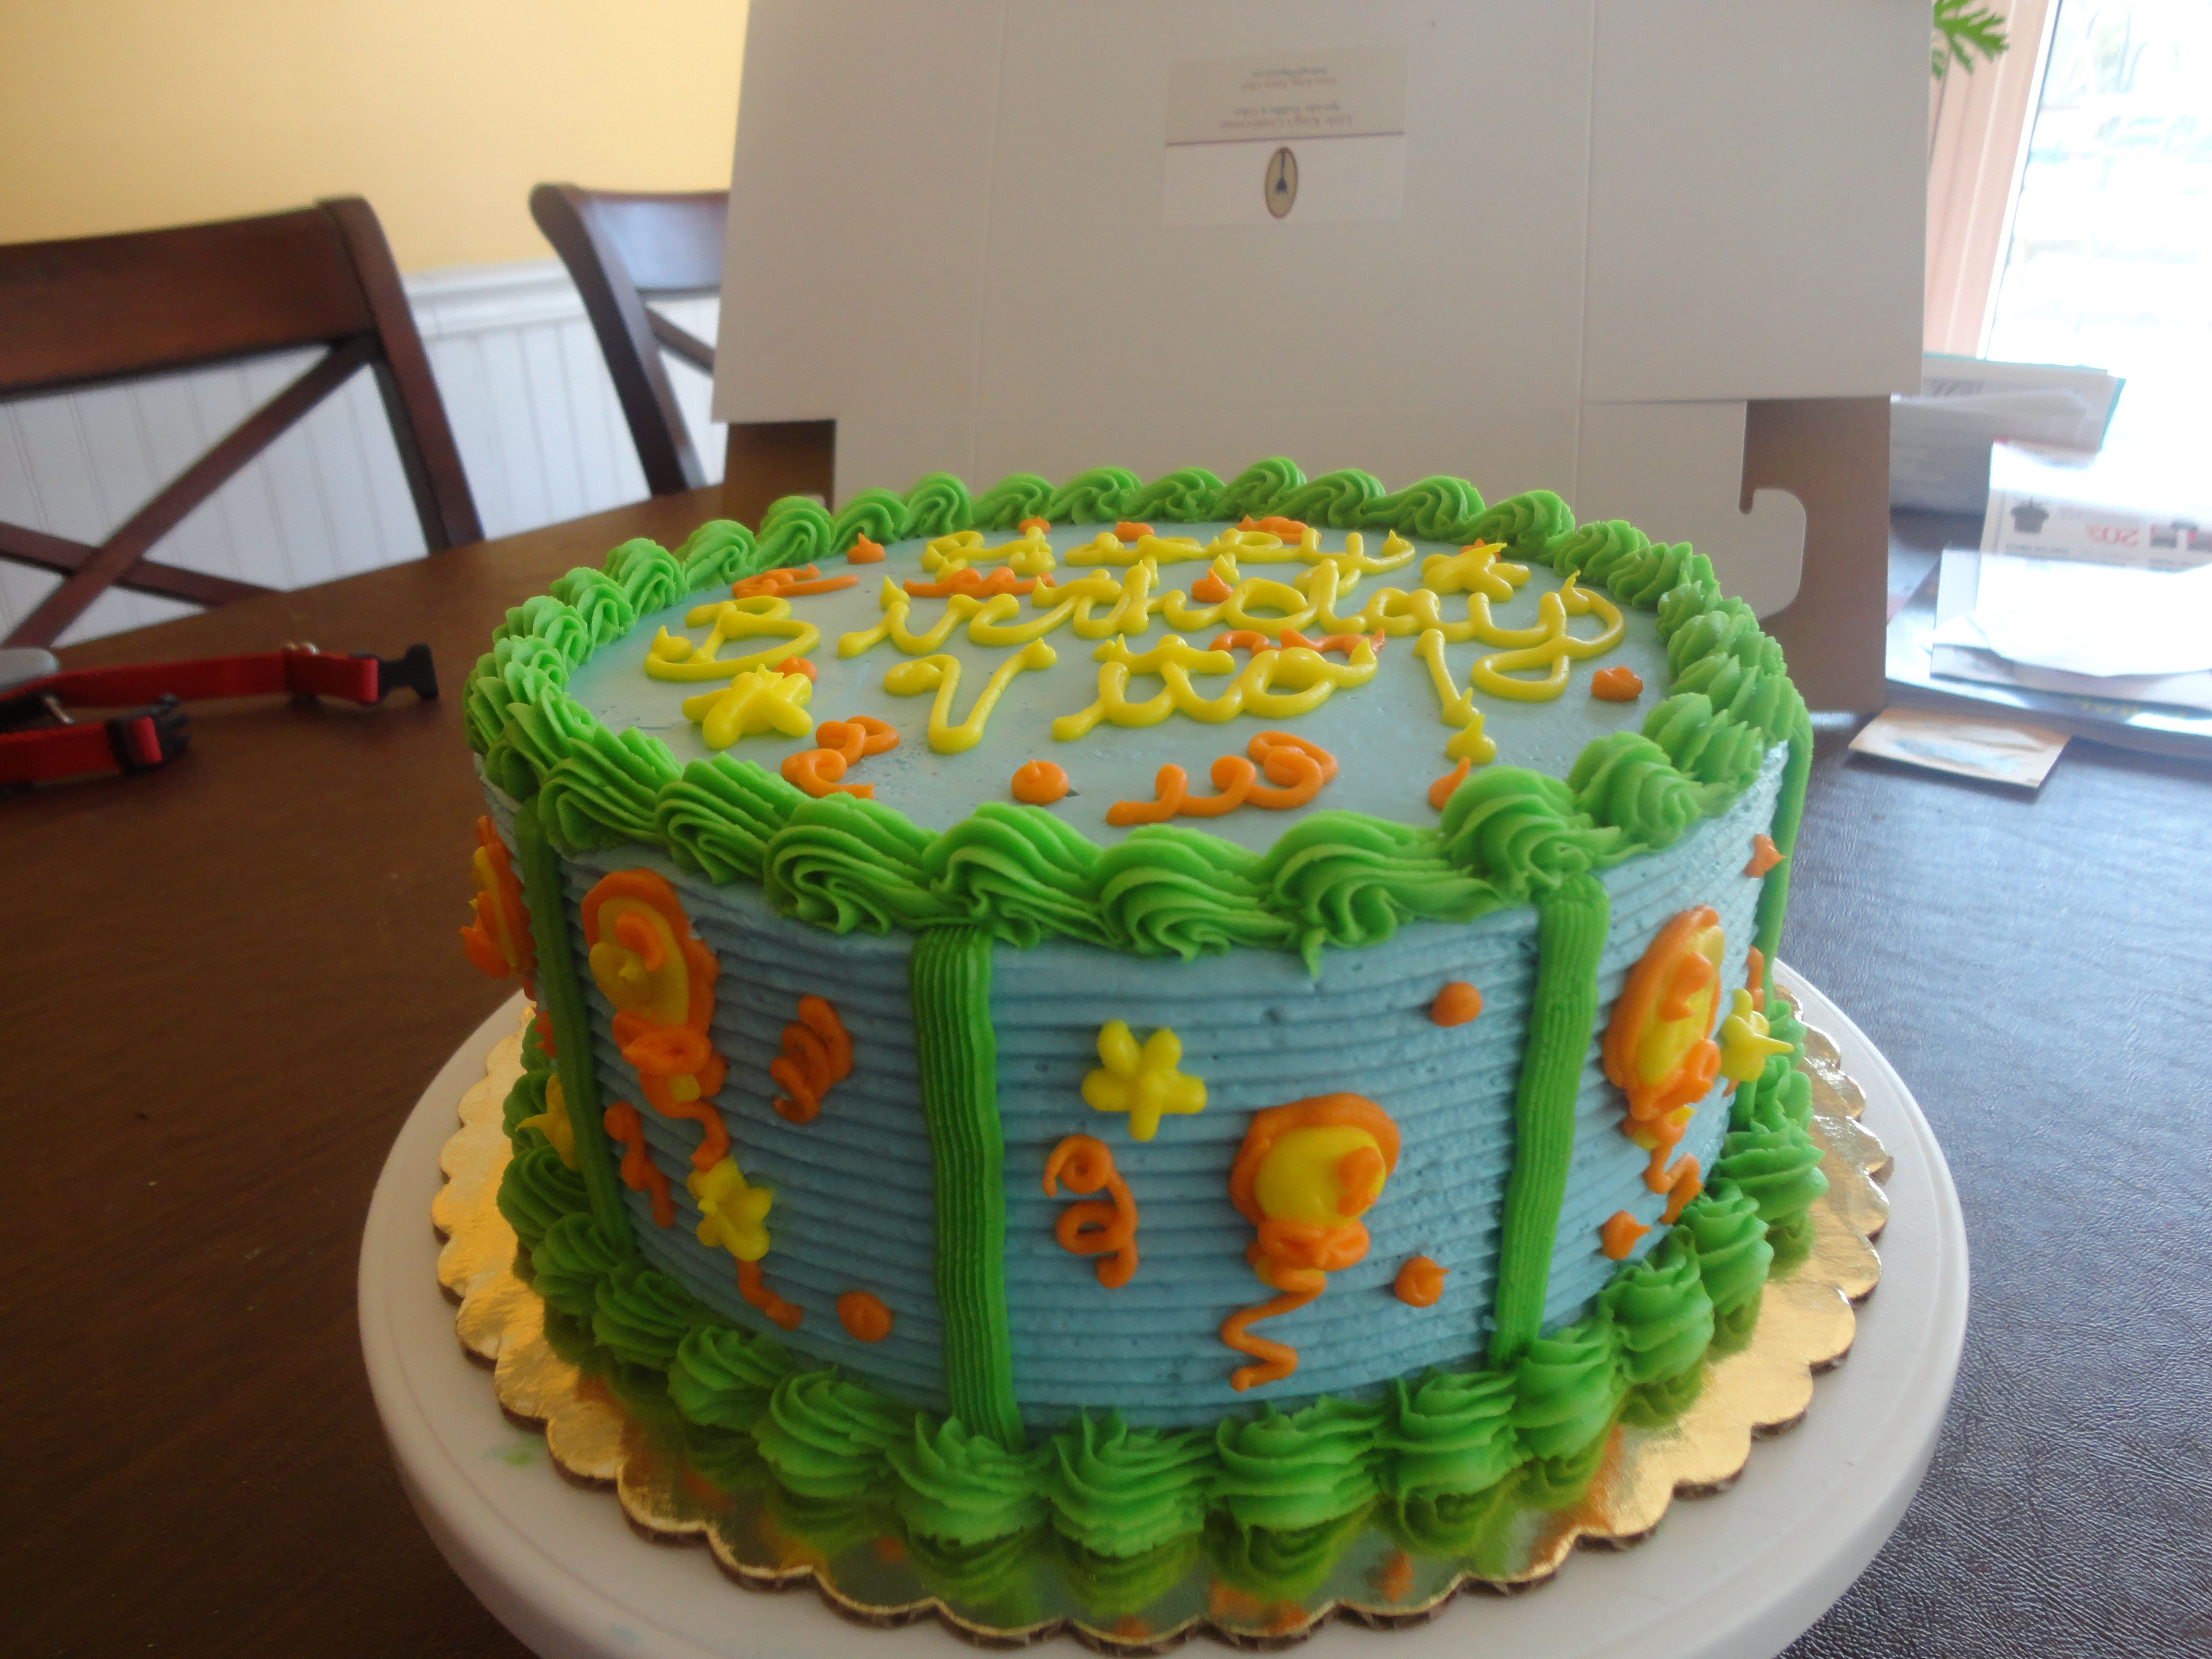 8 Inch Round Birthday Cake Google Search Round Birthday Cakes